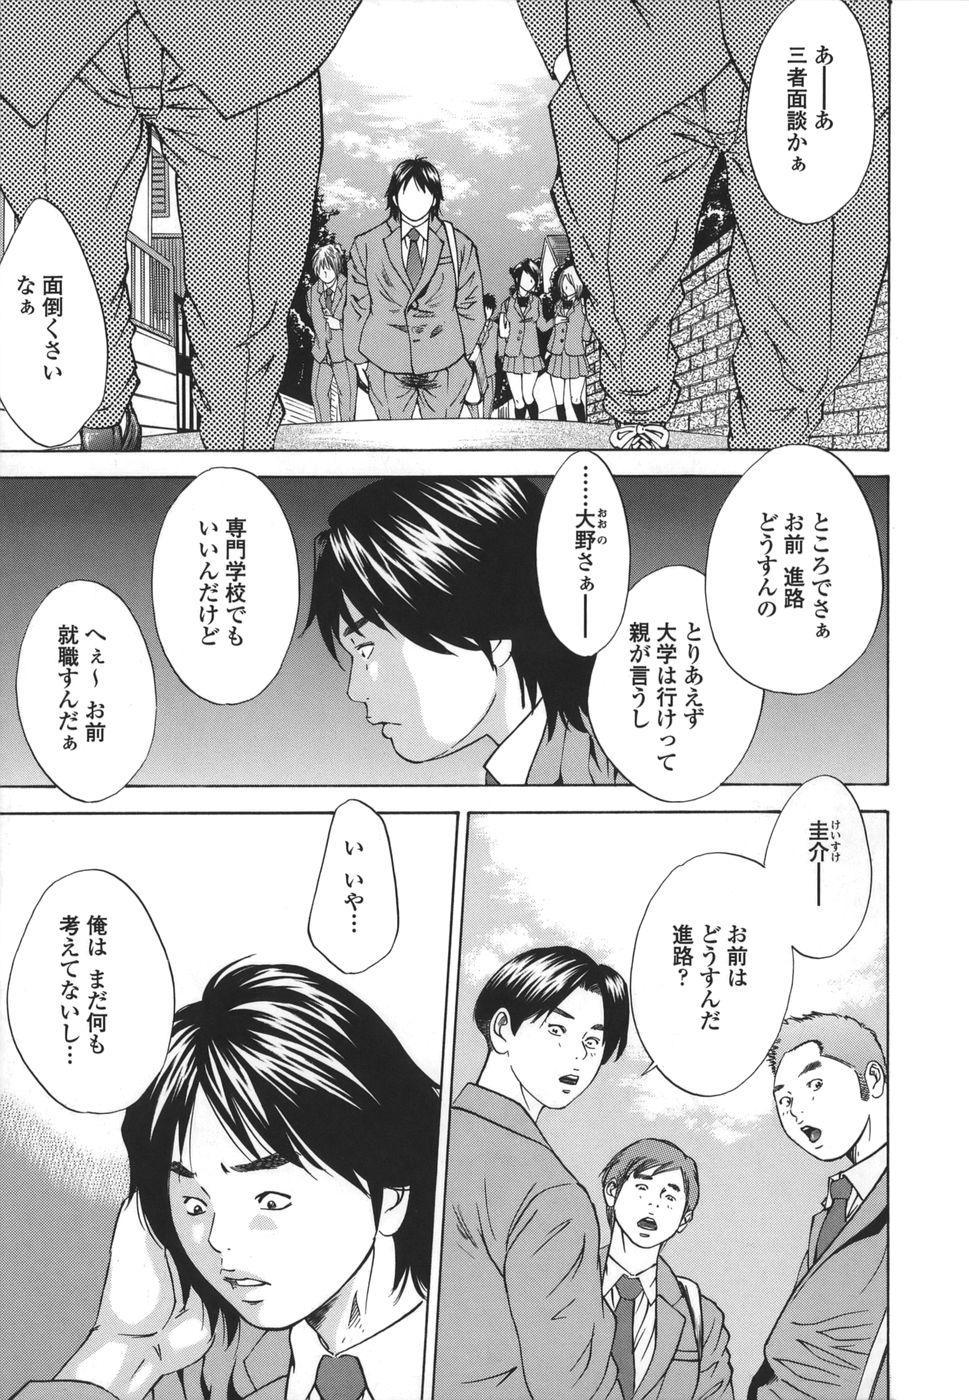 Kinshin Goukan - Near Relation Rapes 168